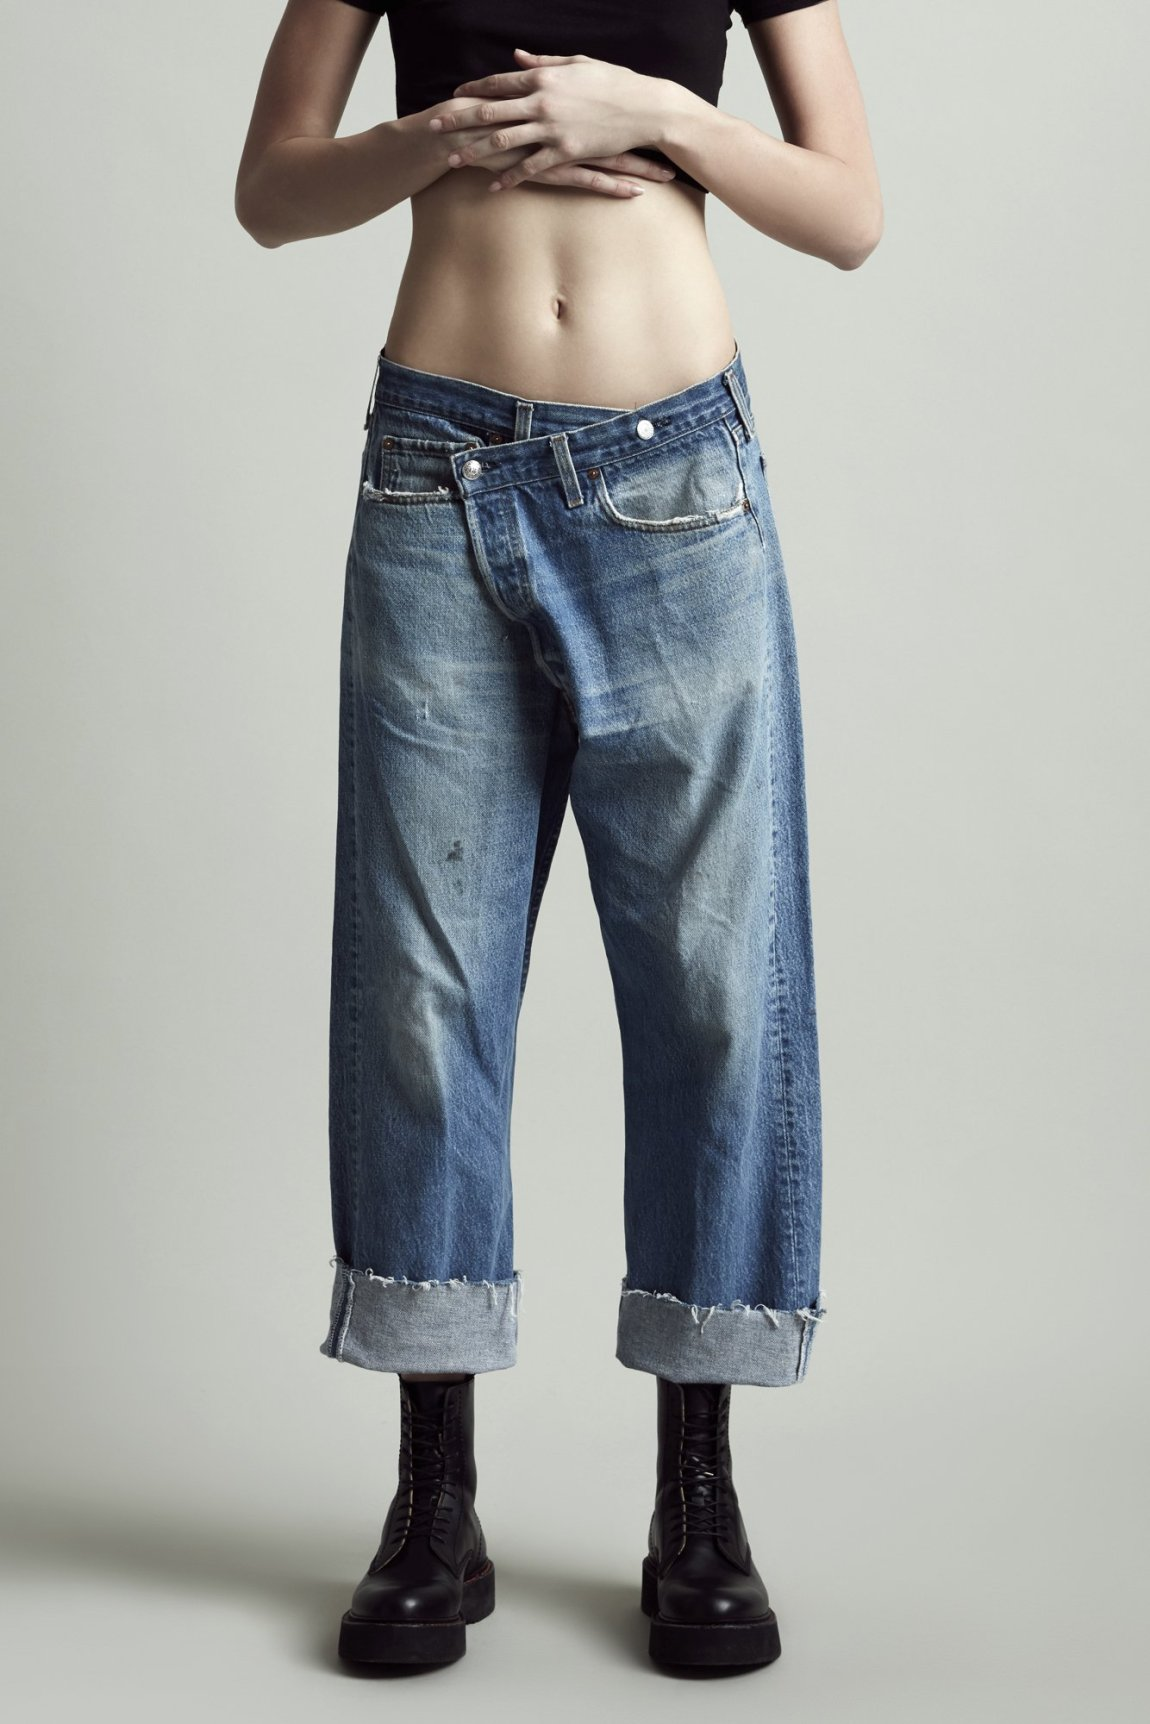 criss cross, crossover jeans, wrap jeans, boyfriend jeans, slouchy, frayed hem, R13